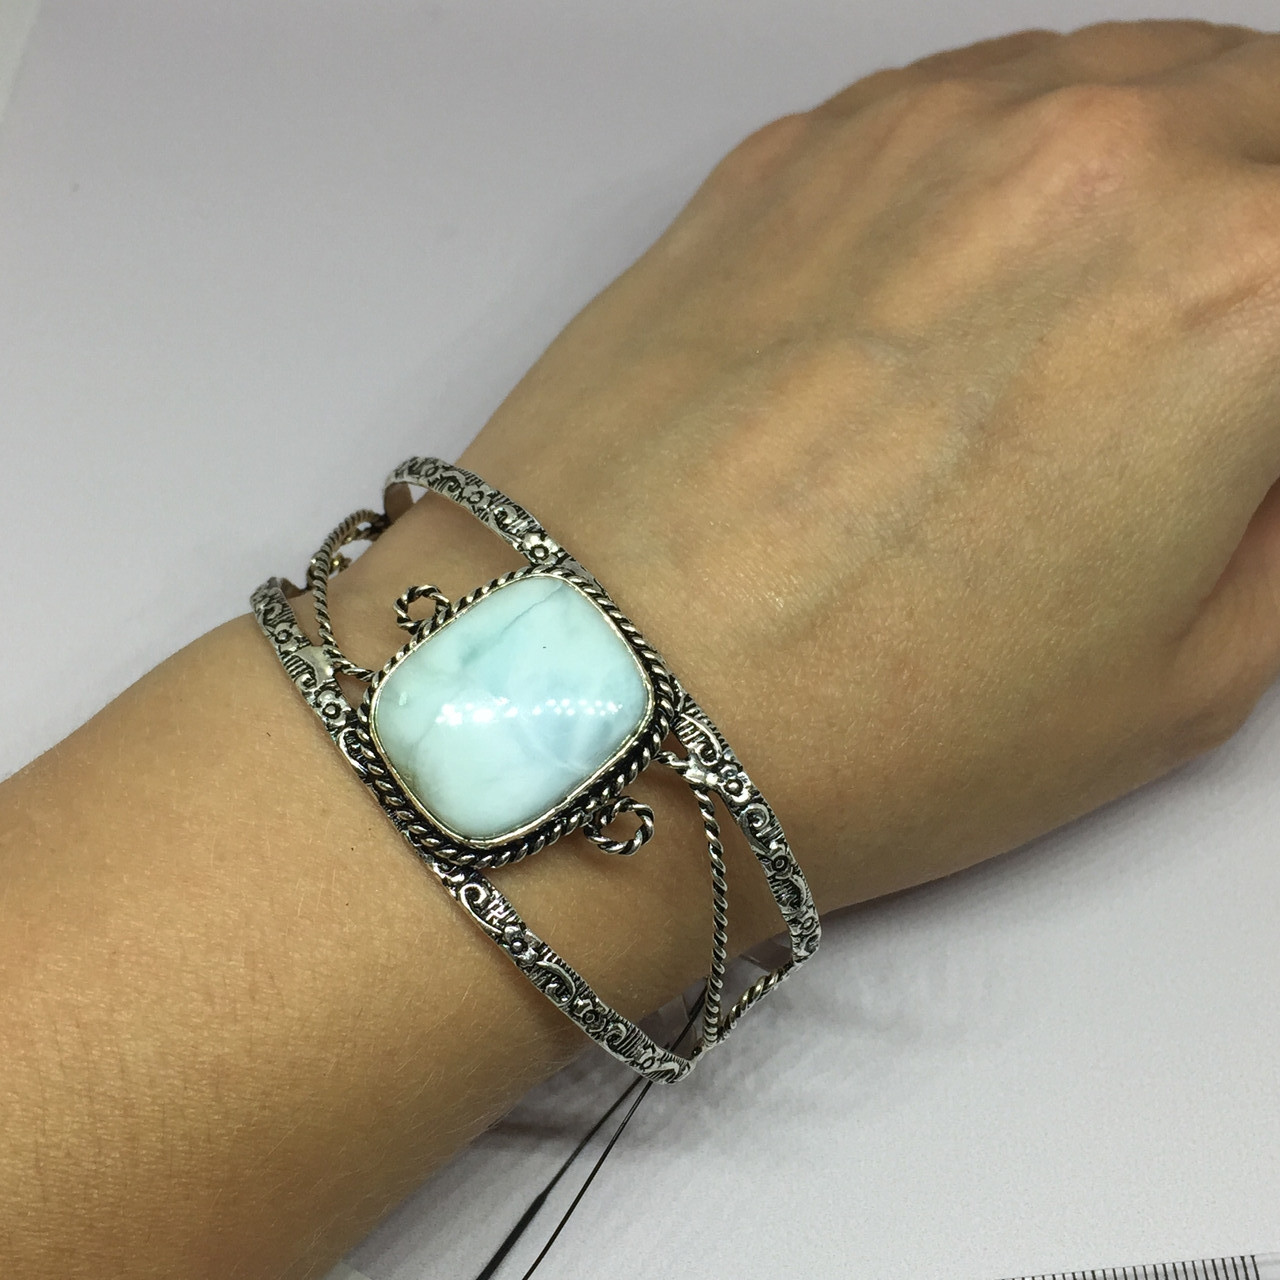 Ларимар браслет с ларимаром браслет-манжет с камнем ларимар (Доминикана) в серебре.